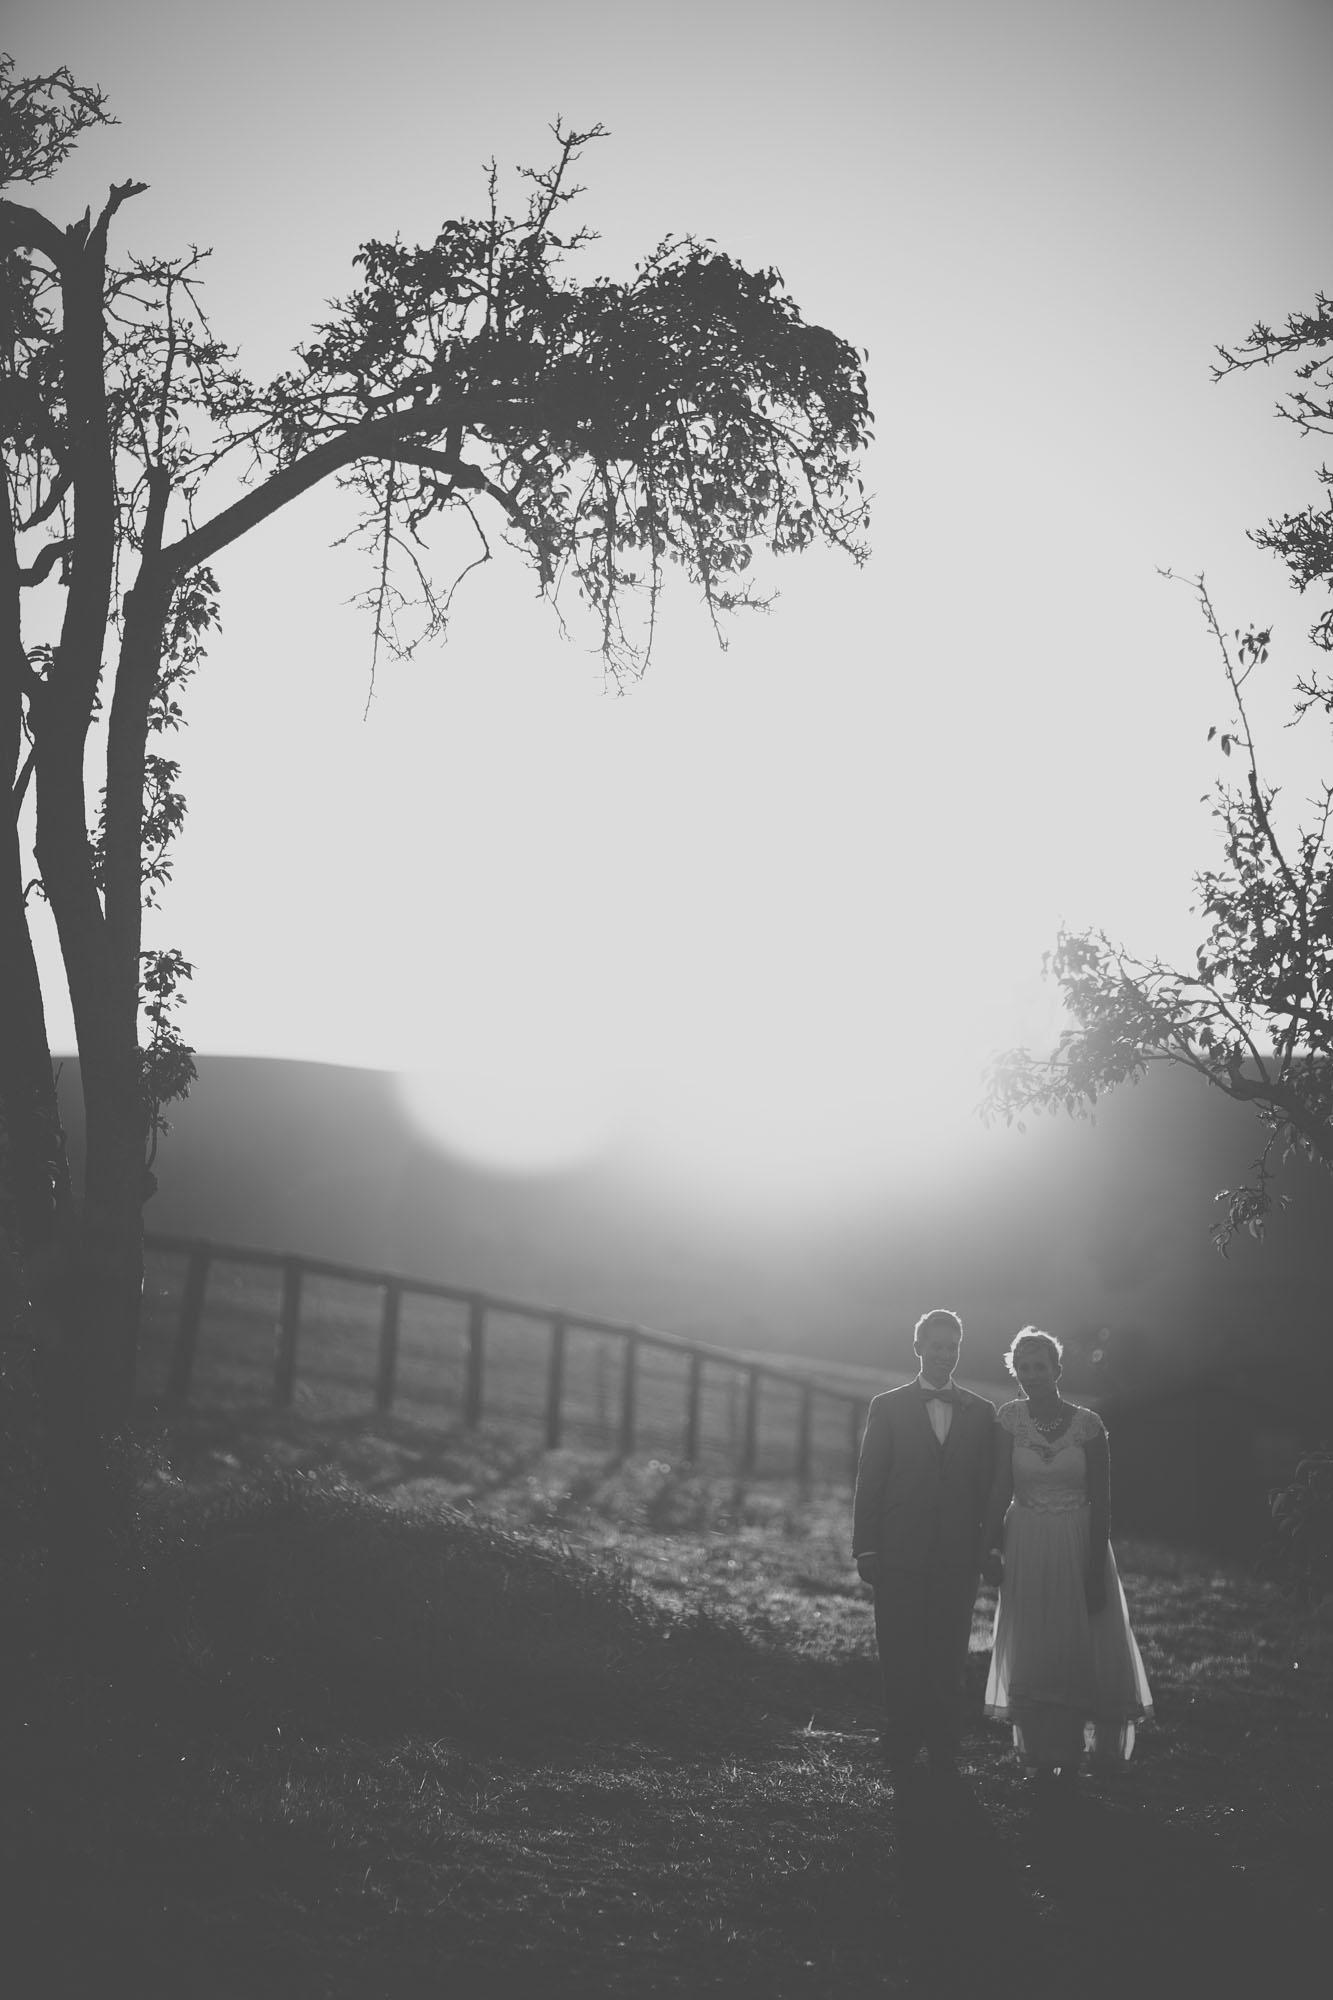 Gretchen_Gause_Petaluma_Olympias_Valley_Wedding_Photo-195.jpg